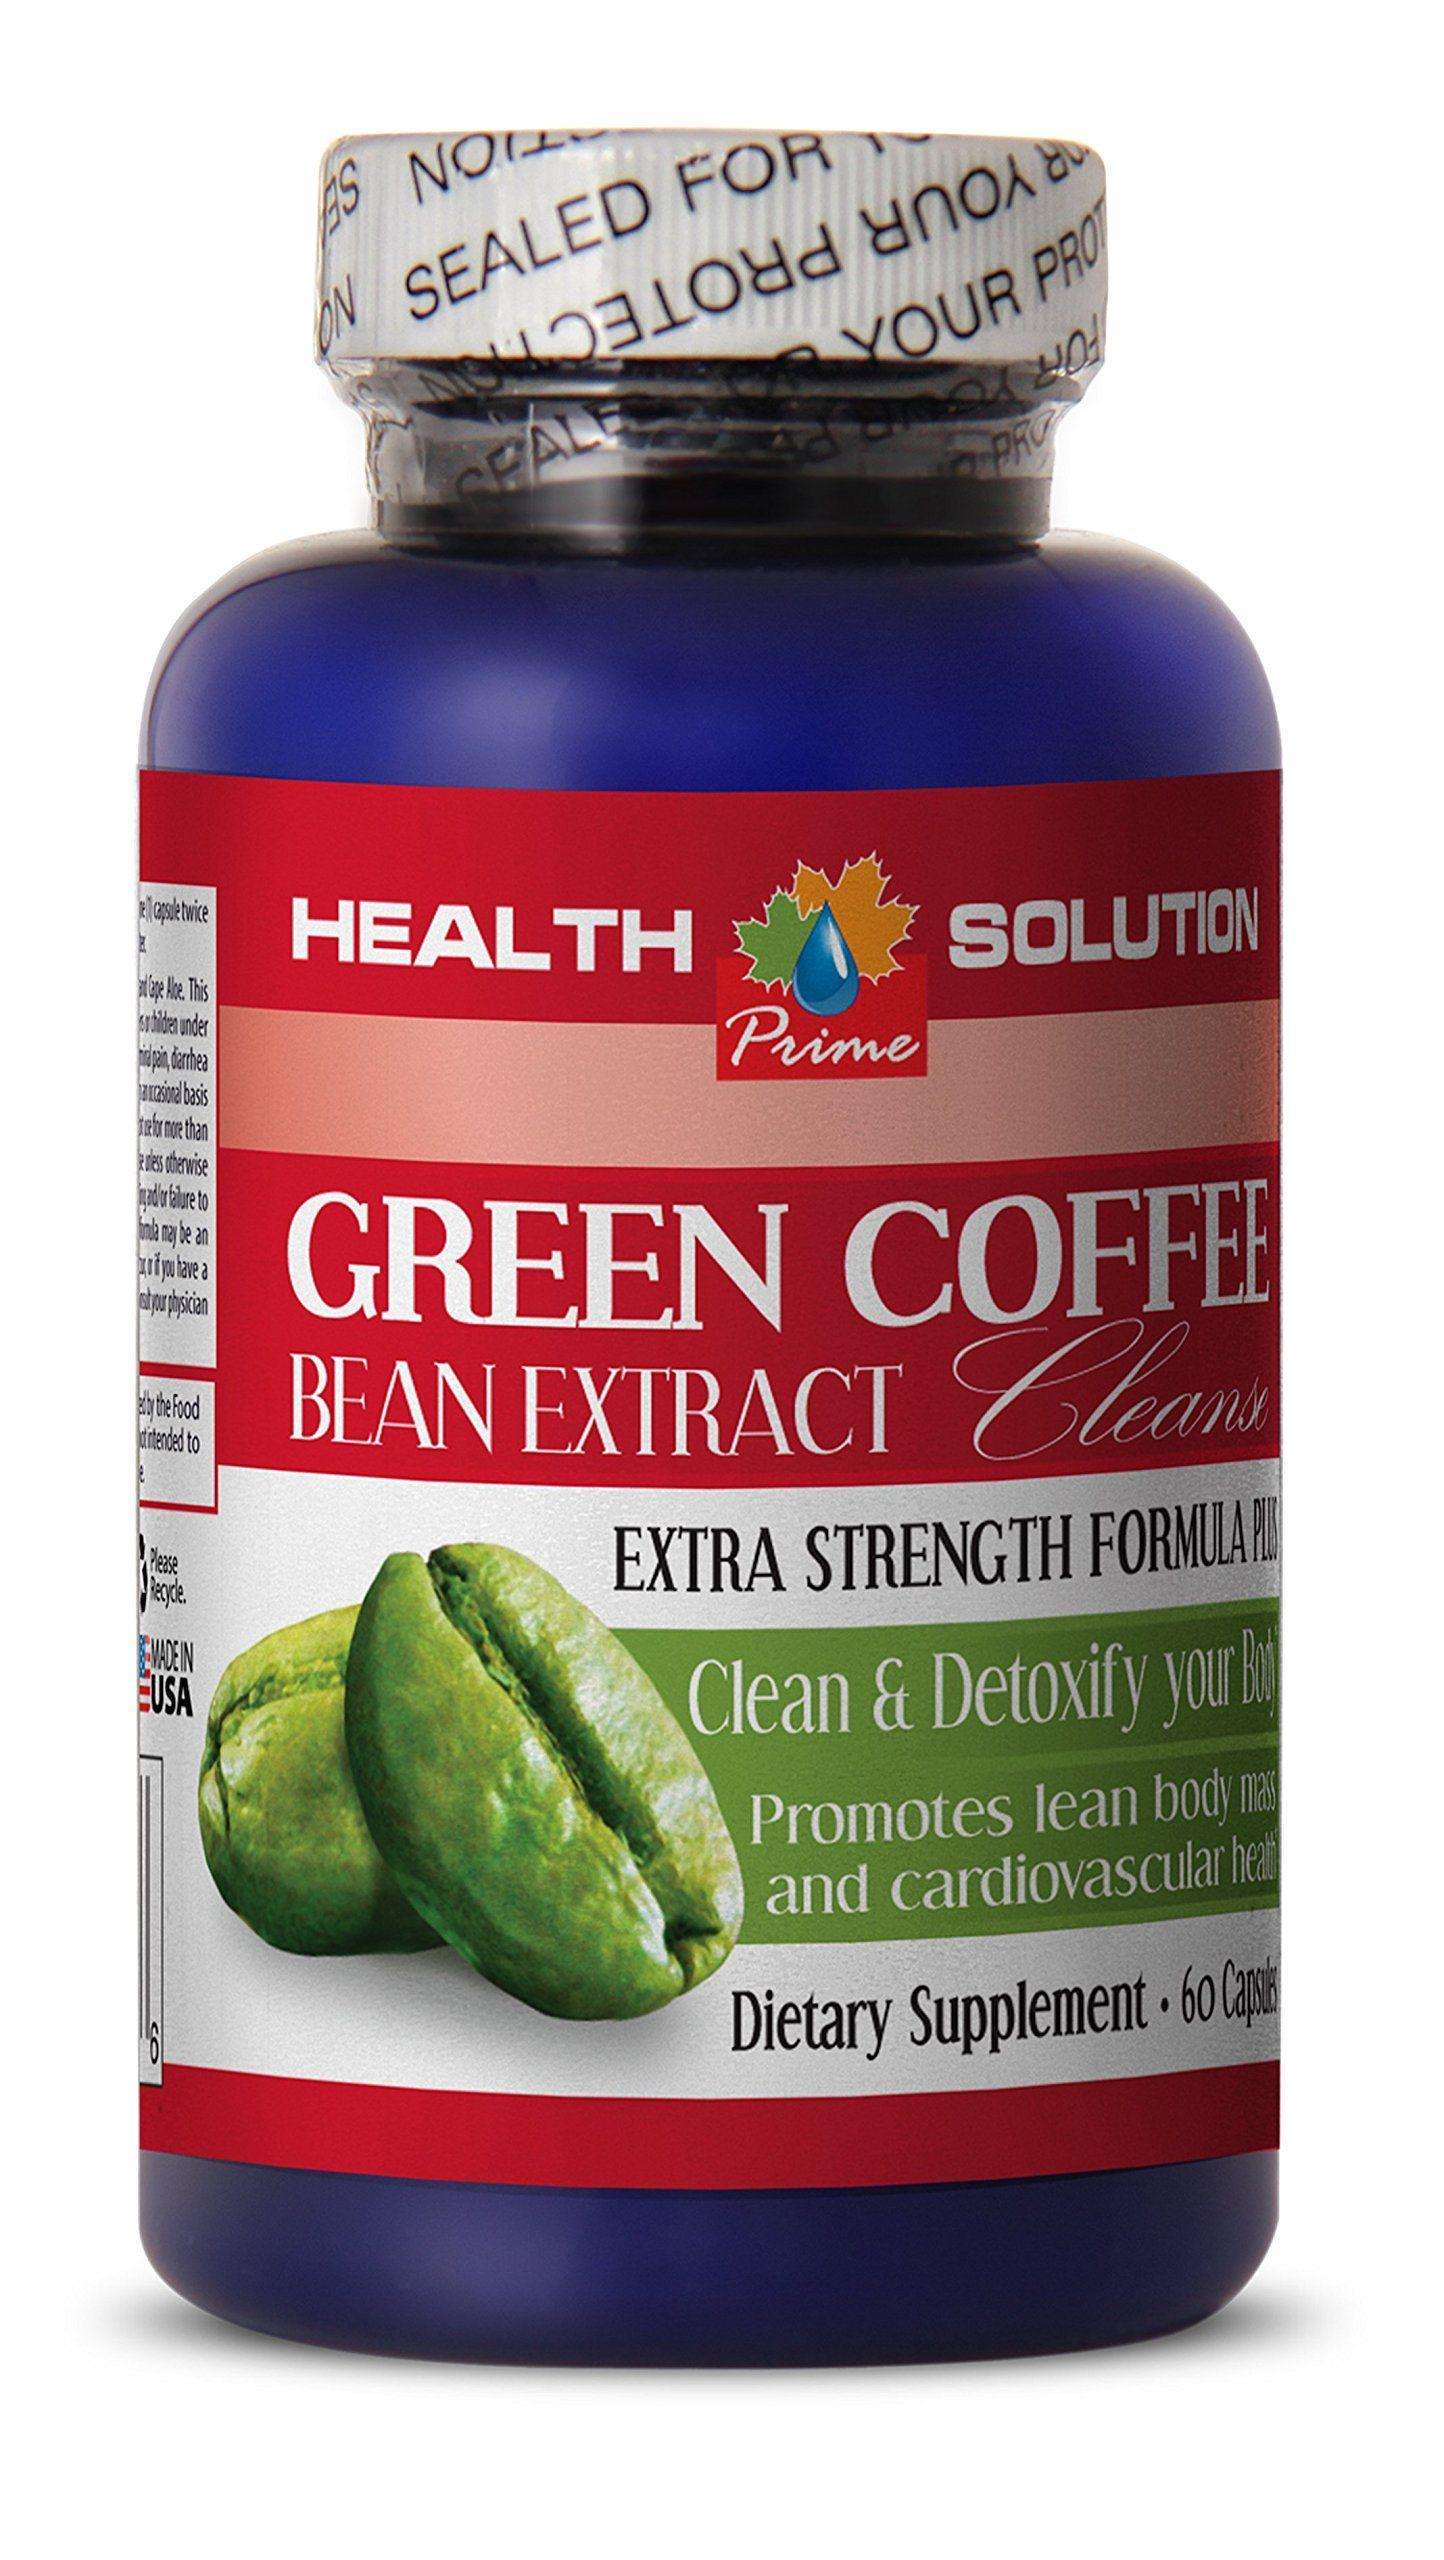 Bentonite Clay Organic GREEN COFFEE BEAN EXTRACT CLEANSE